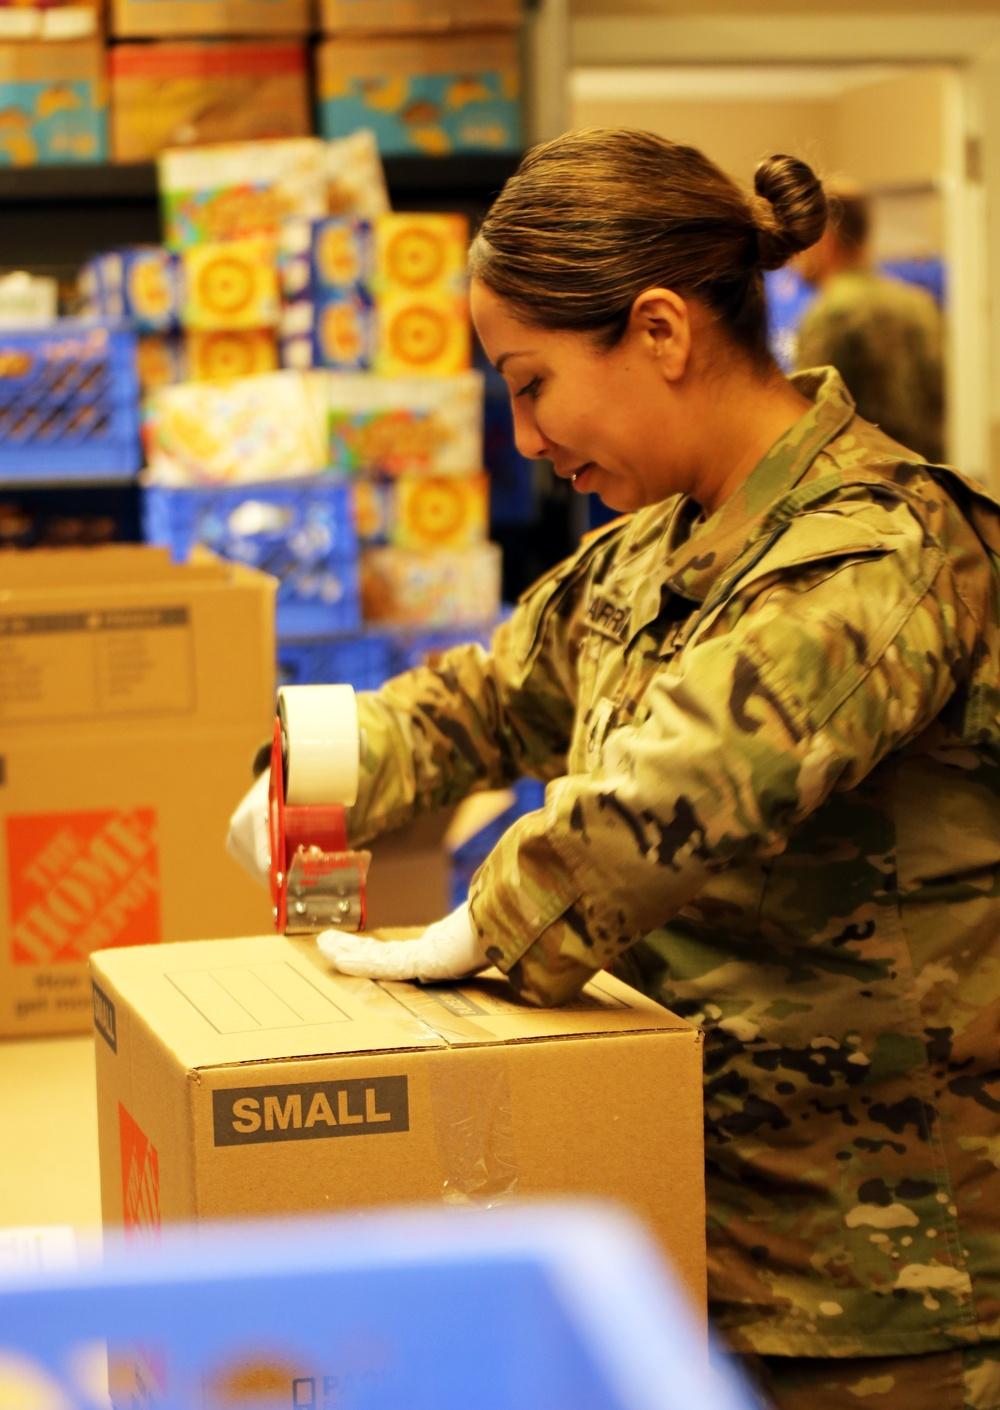 Washington National Guard members respond to the COVID-19 pandemic